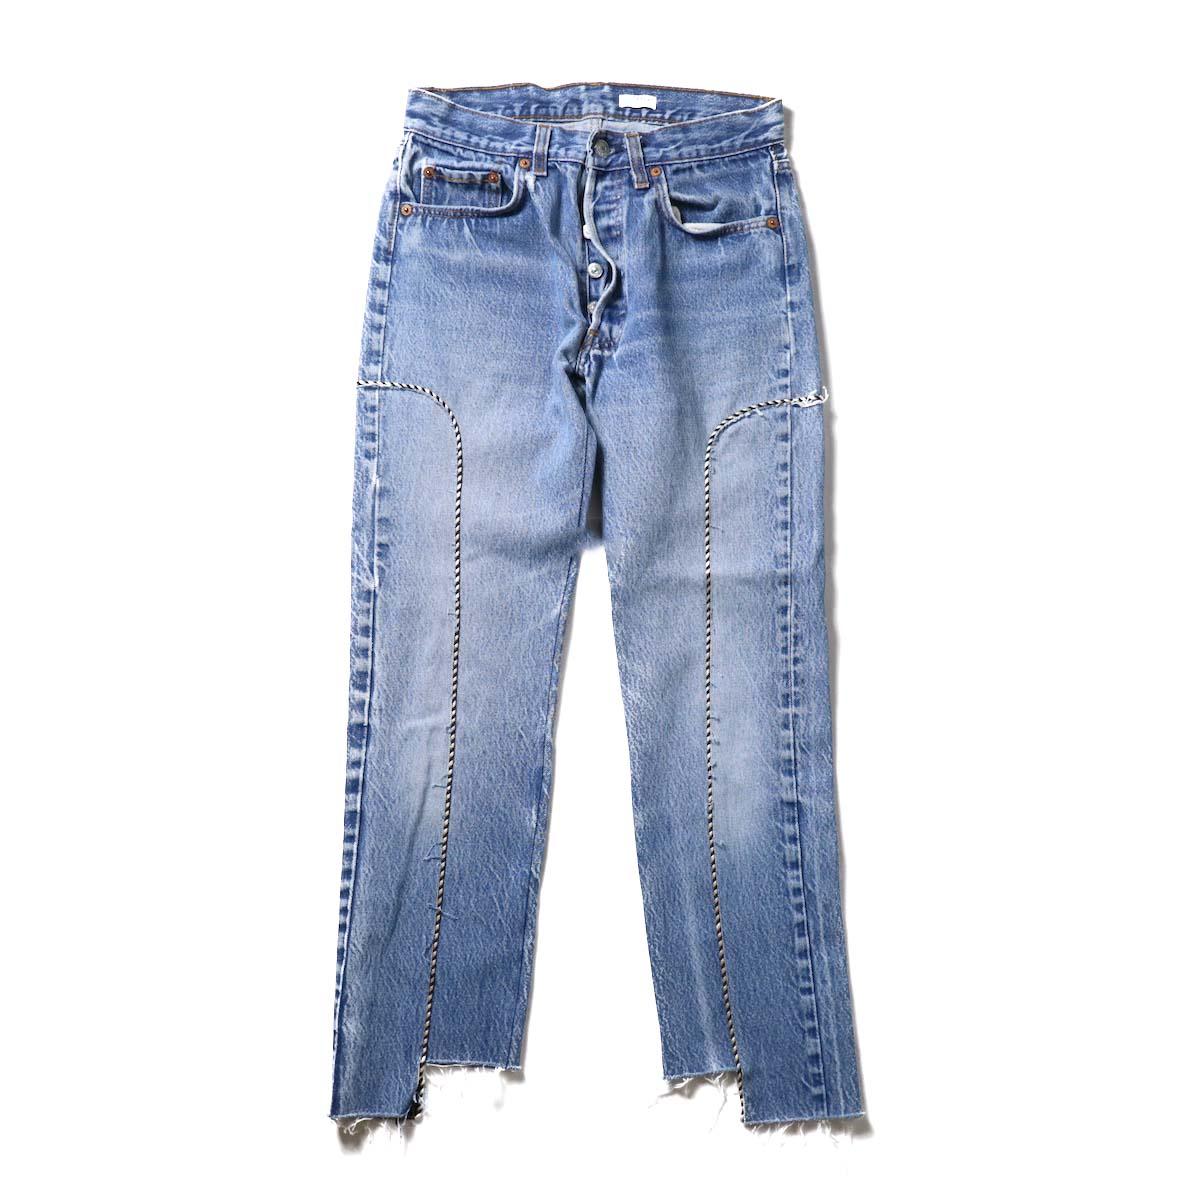 OLD PARK / Western Jeans Blue (Ssize-C)